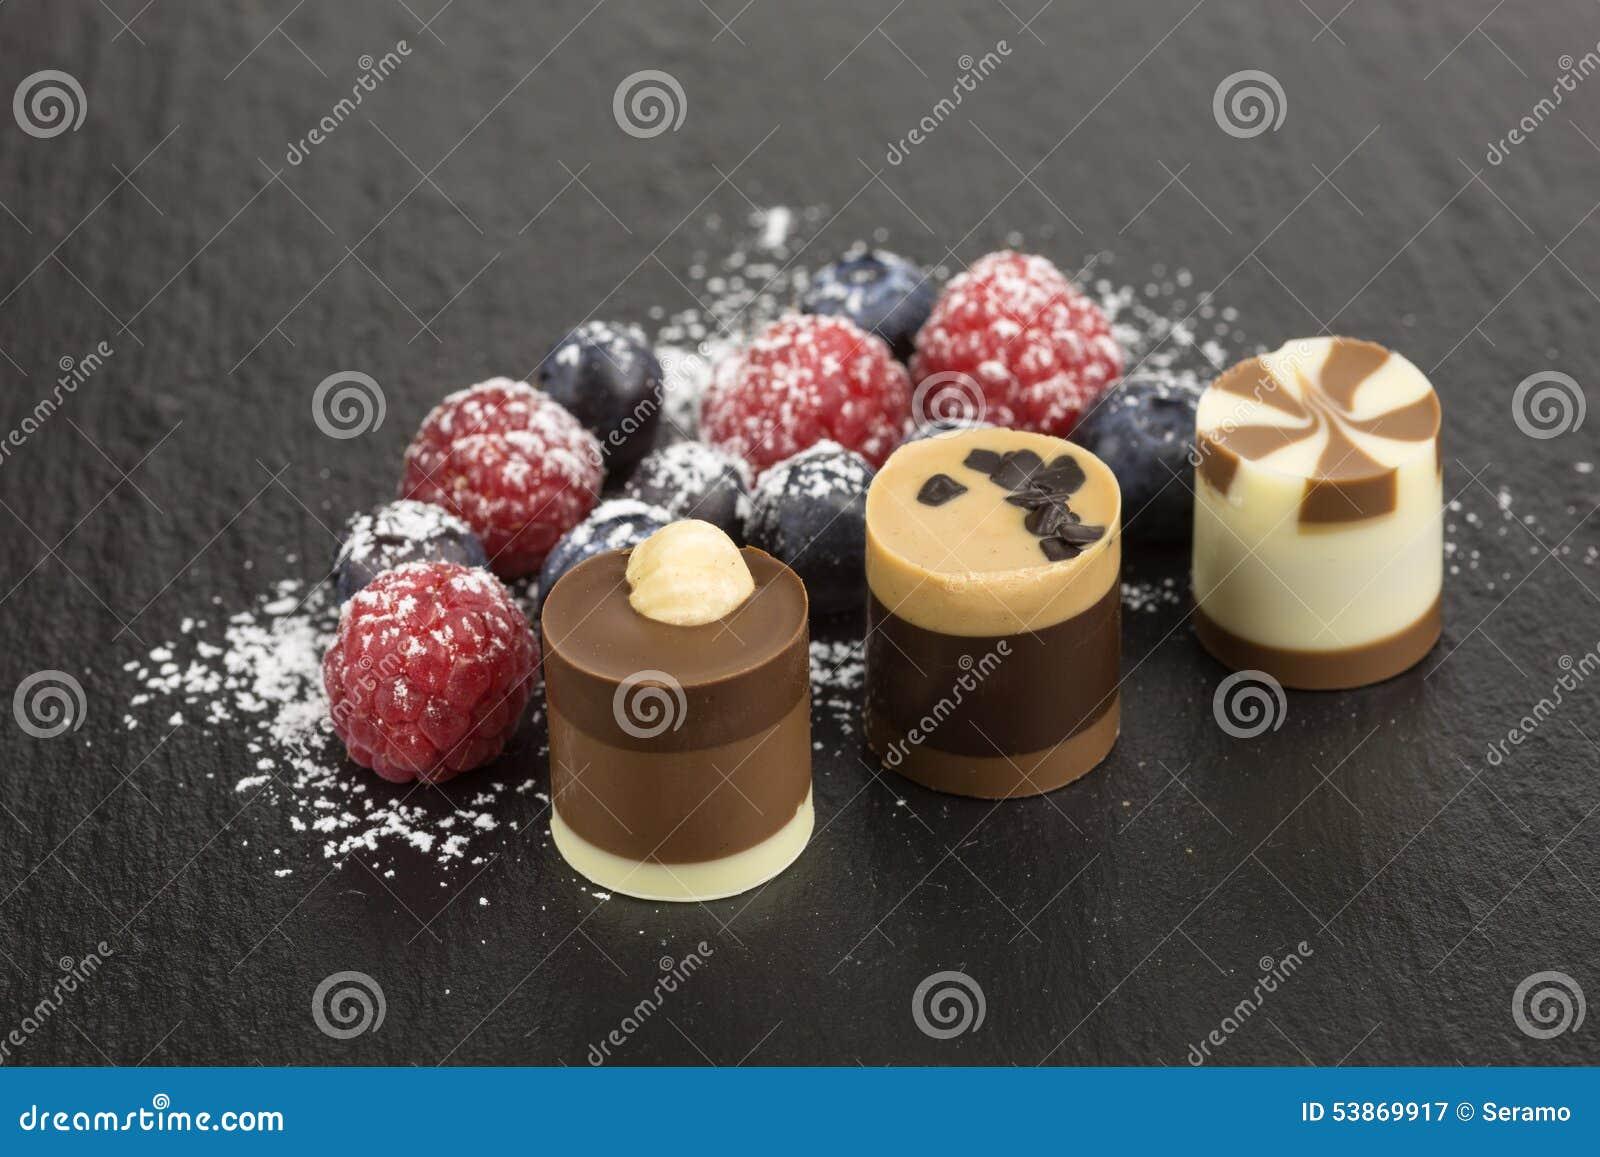 Chocolate Dessert With Berries Stock Photo Image 53869917